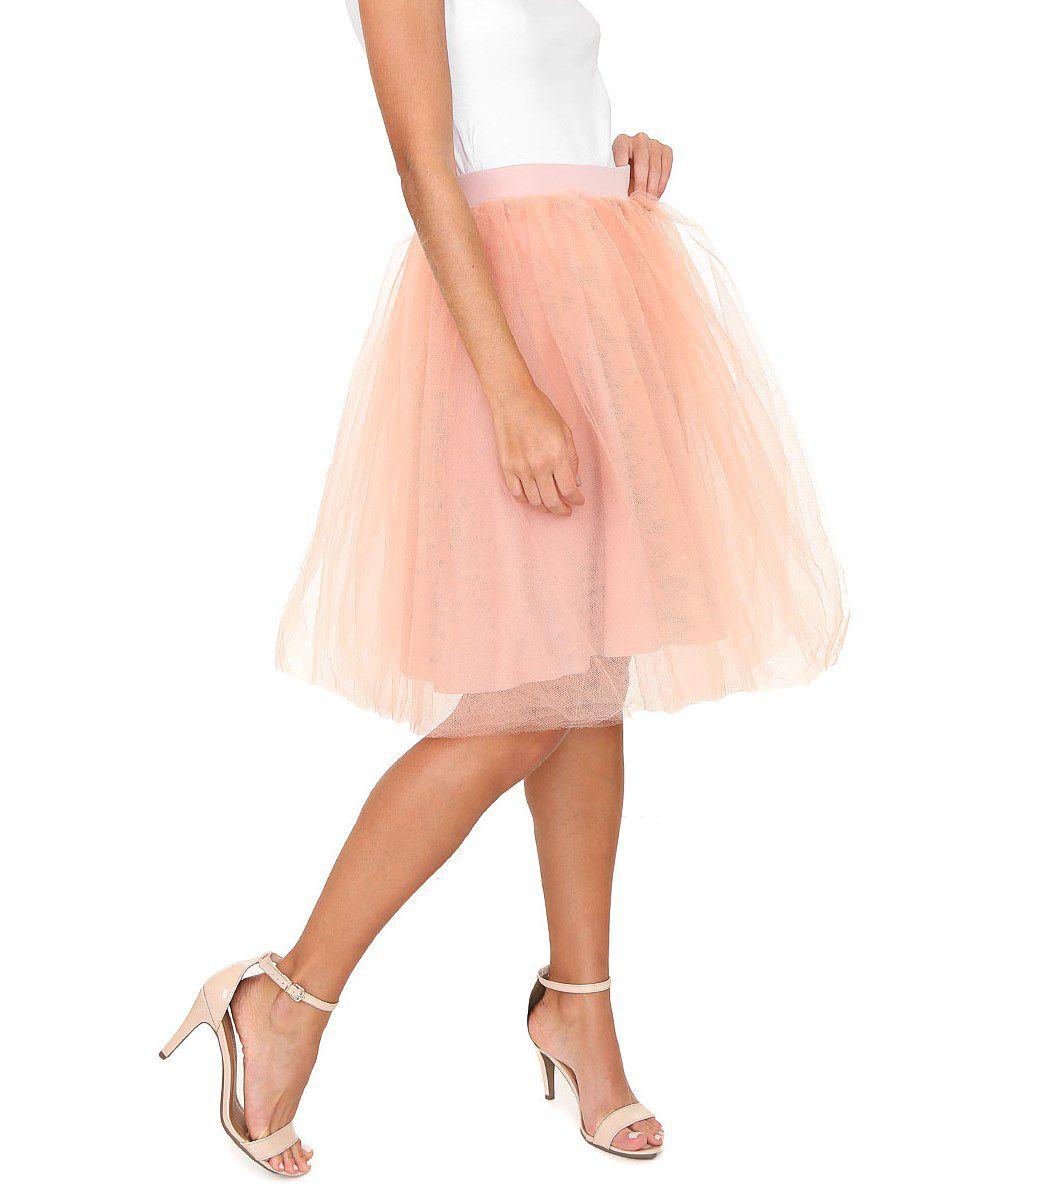 Saia Tule Midi Amo Tule Fantasy Bailarina Moda Clássica Ballet